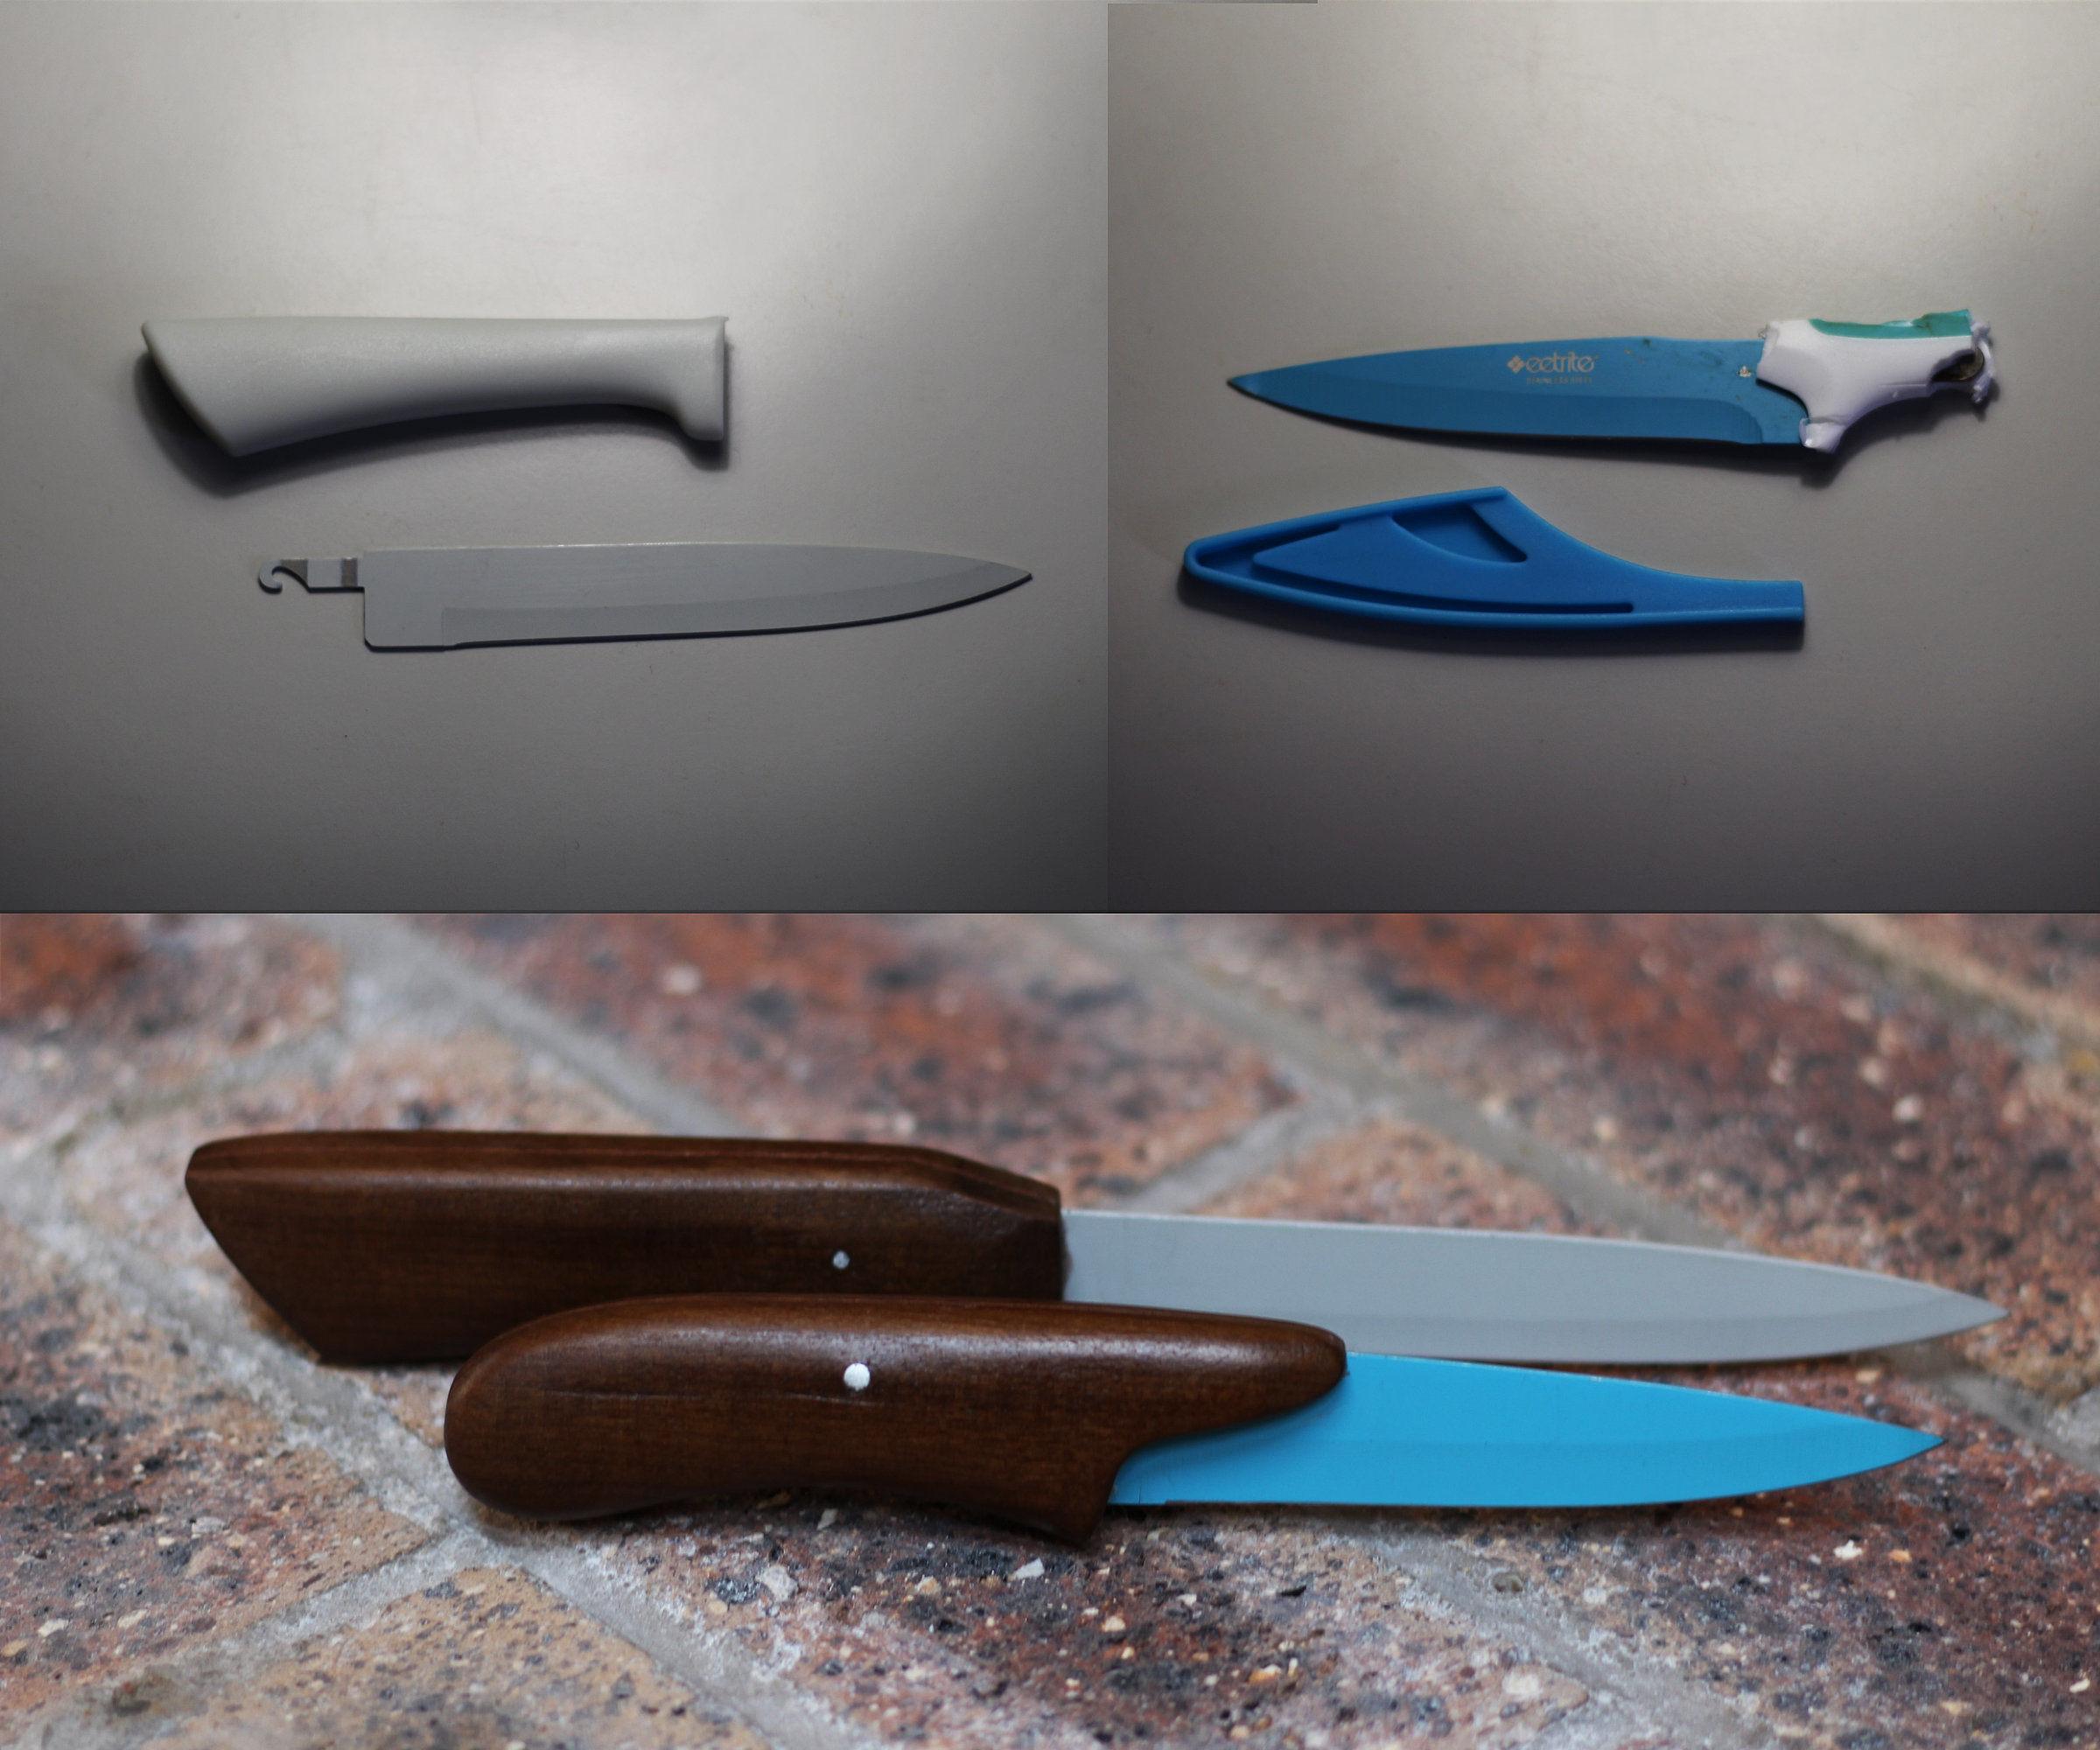 Refurbished Knife With Broken Handle